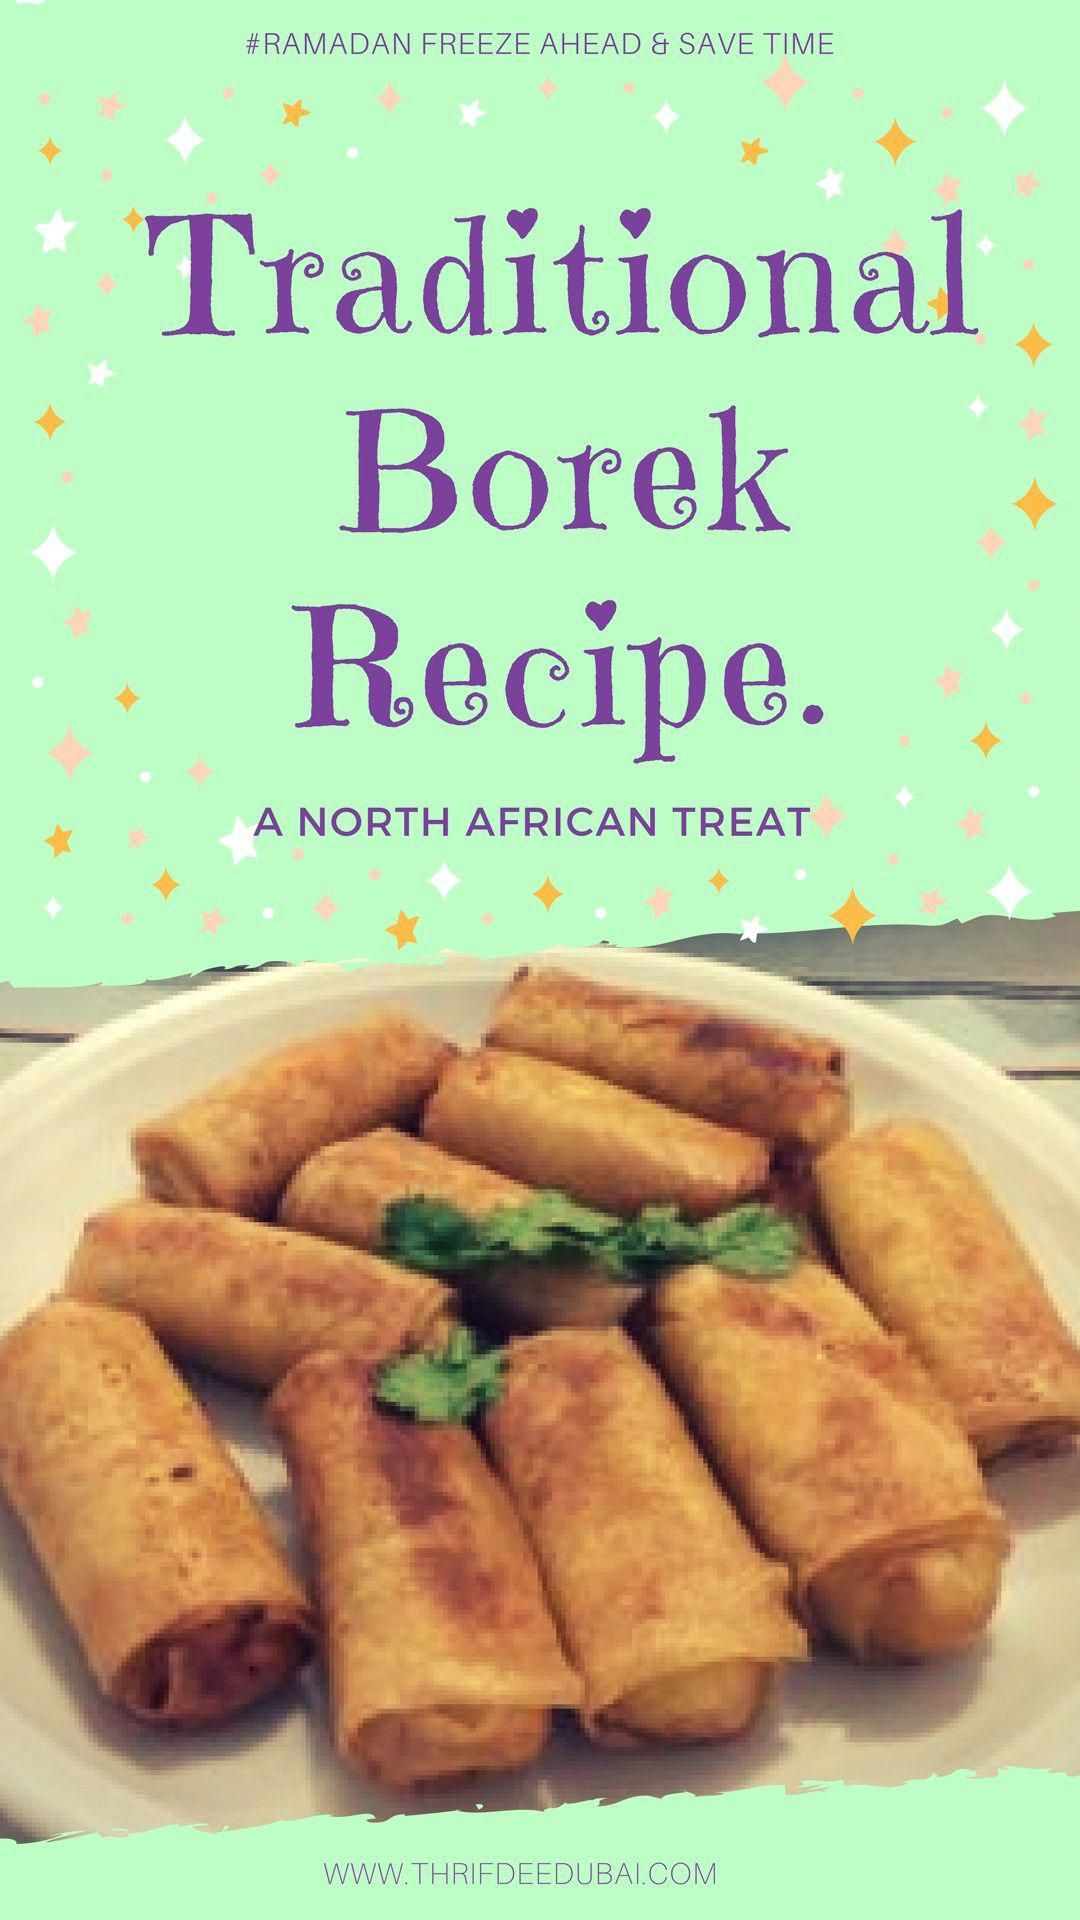 Borek Recips with step by step guide! A modern twist on a traditional Algerian dish! Ramadan preparation begins here! Arabic Middle Eastern Recipes. . . . #Ramadan#NorthAfrican#Algerian#Moroccan#Tunisian#ramadanseries#ramadanready#appetiser#starter#easyfood#kidfriendly#lifestyle#foolproof#recipe#ideas#savoury#potluck#springrolls#samosa#fatyer#sombosek#middleeastern#Arabic#lifestyleblogger#family#kidsfavs#kitchenhacks #borekrecipe